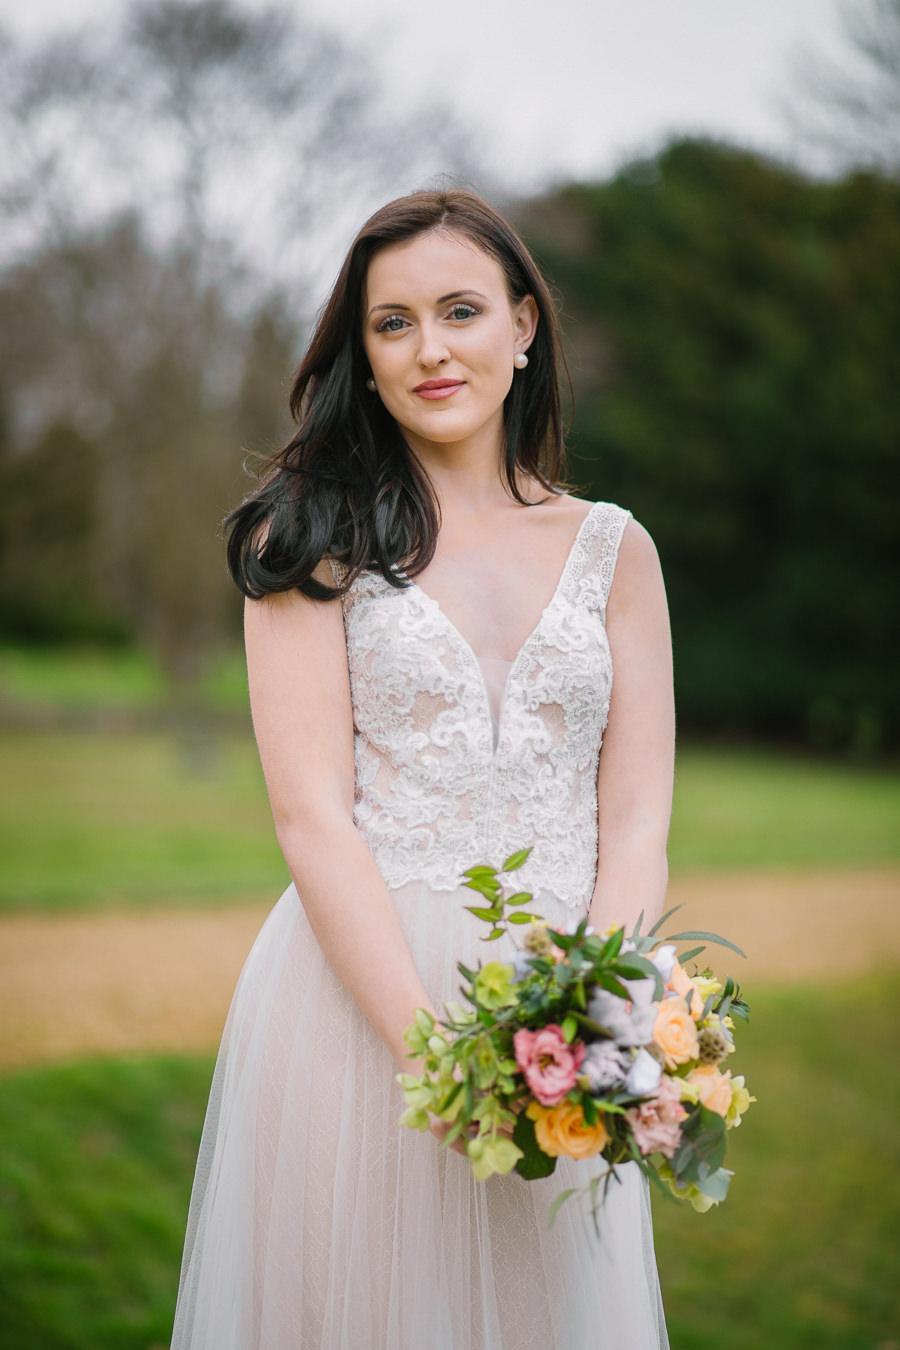 'Understated Elegance' Spring Styled Hampshire Bridal Shoot – Rownhams House, photo credit Nisha Haq Photography (20)